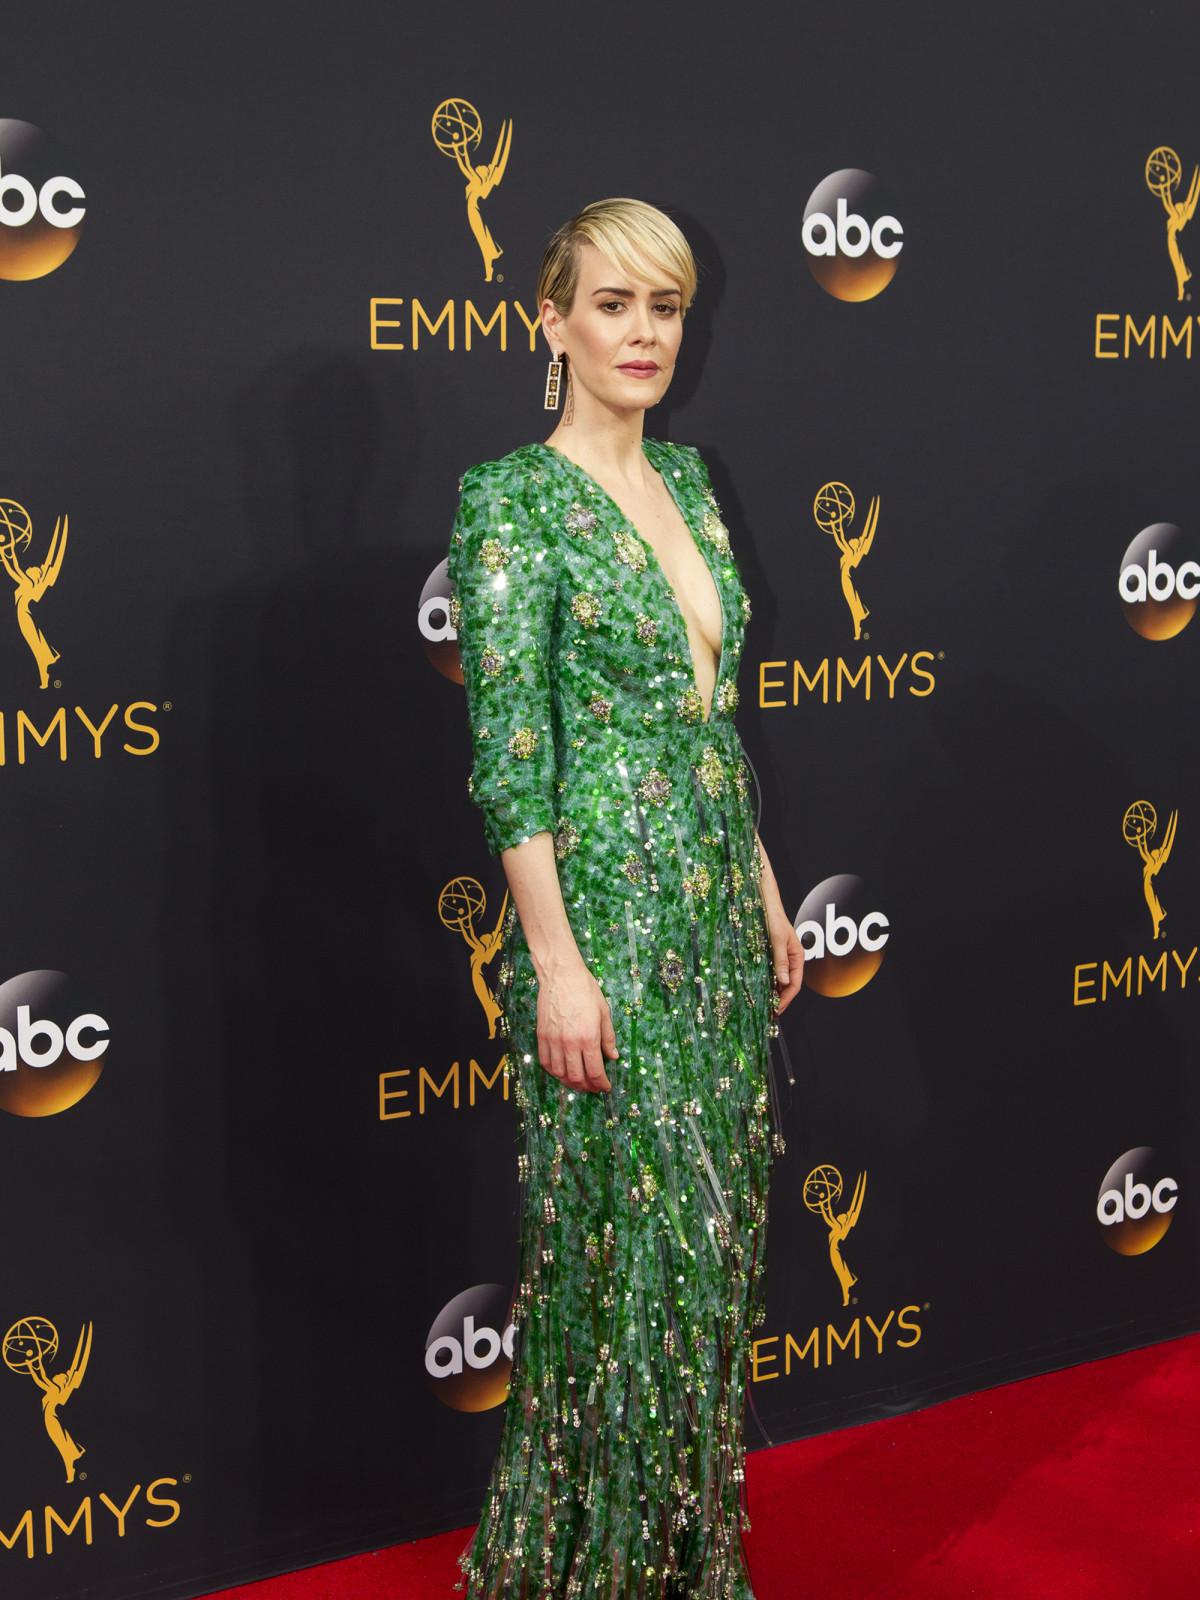 Sarah Paulson at Emmy Awards in Pradagown